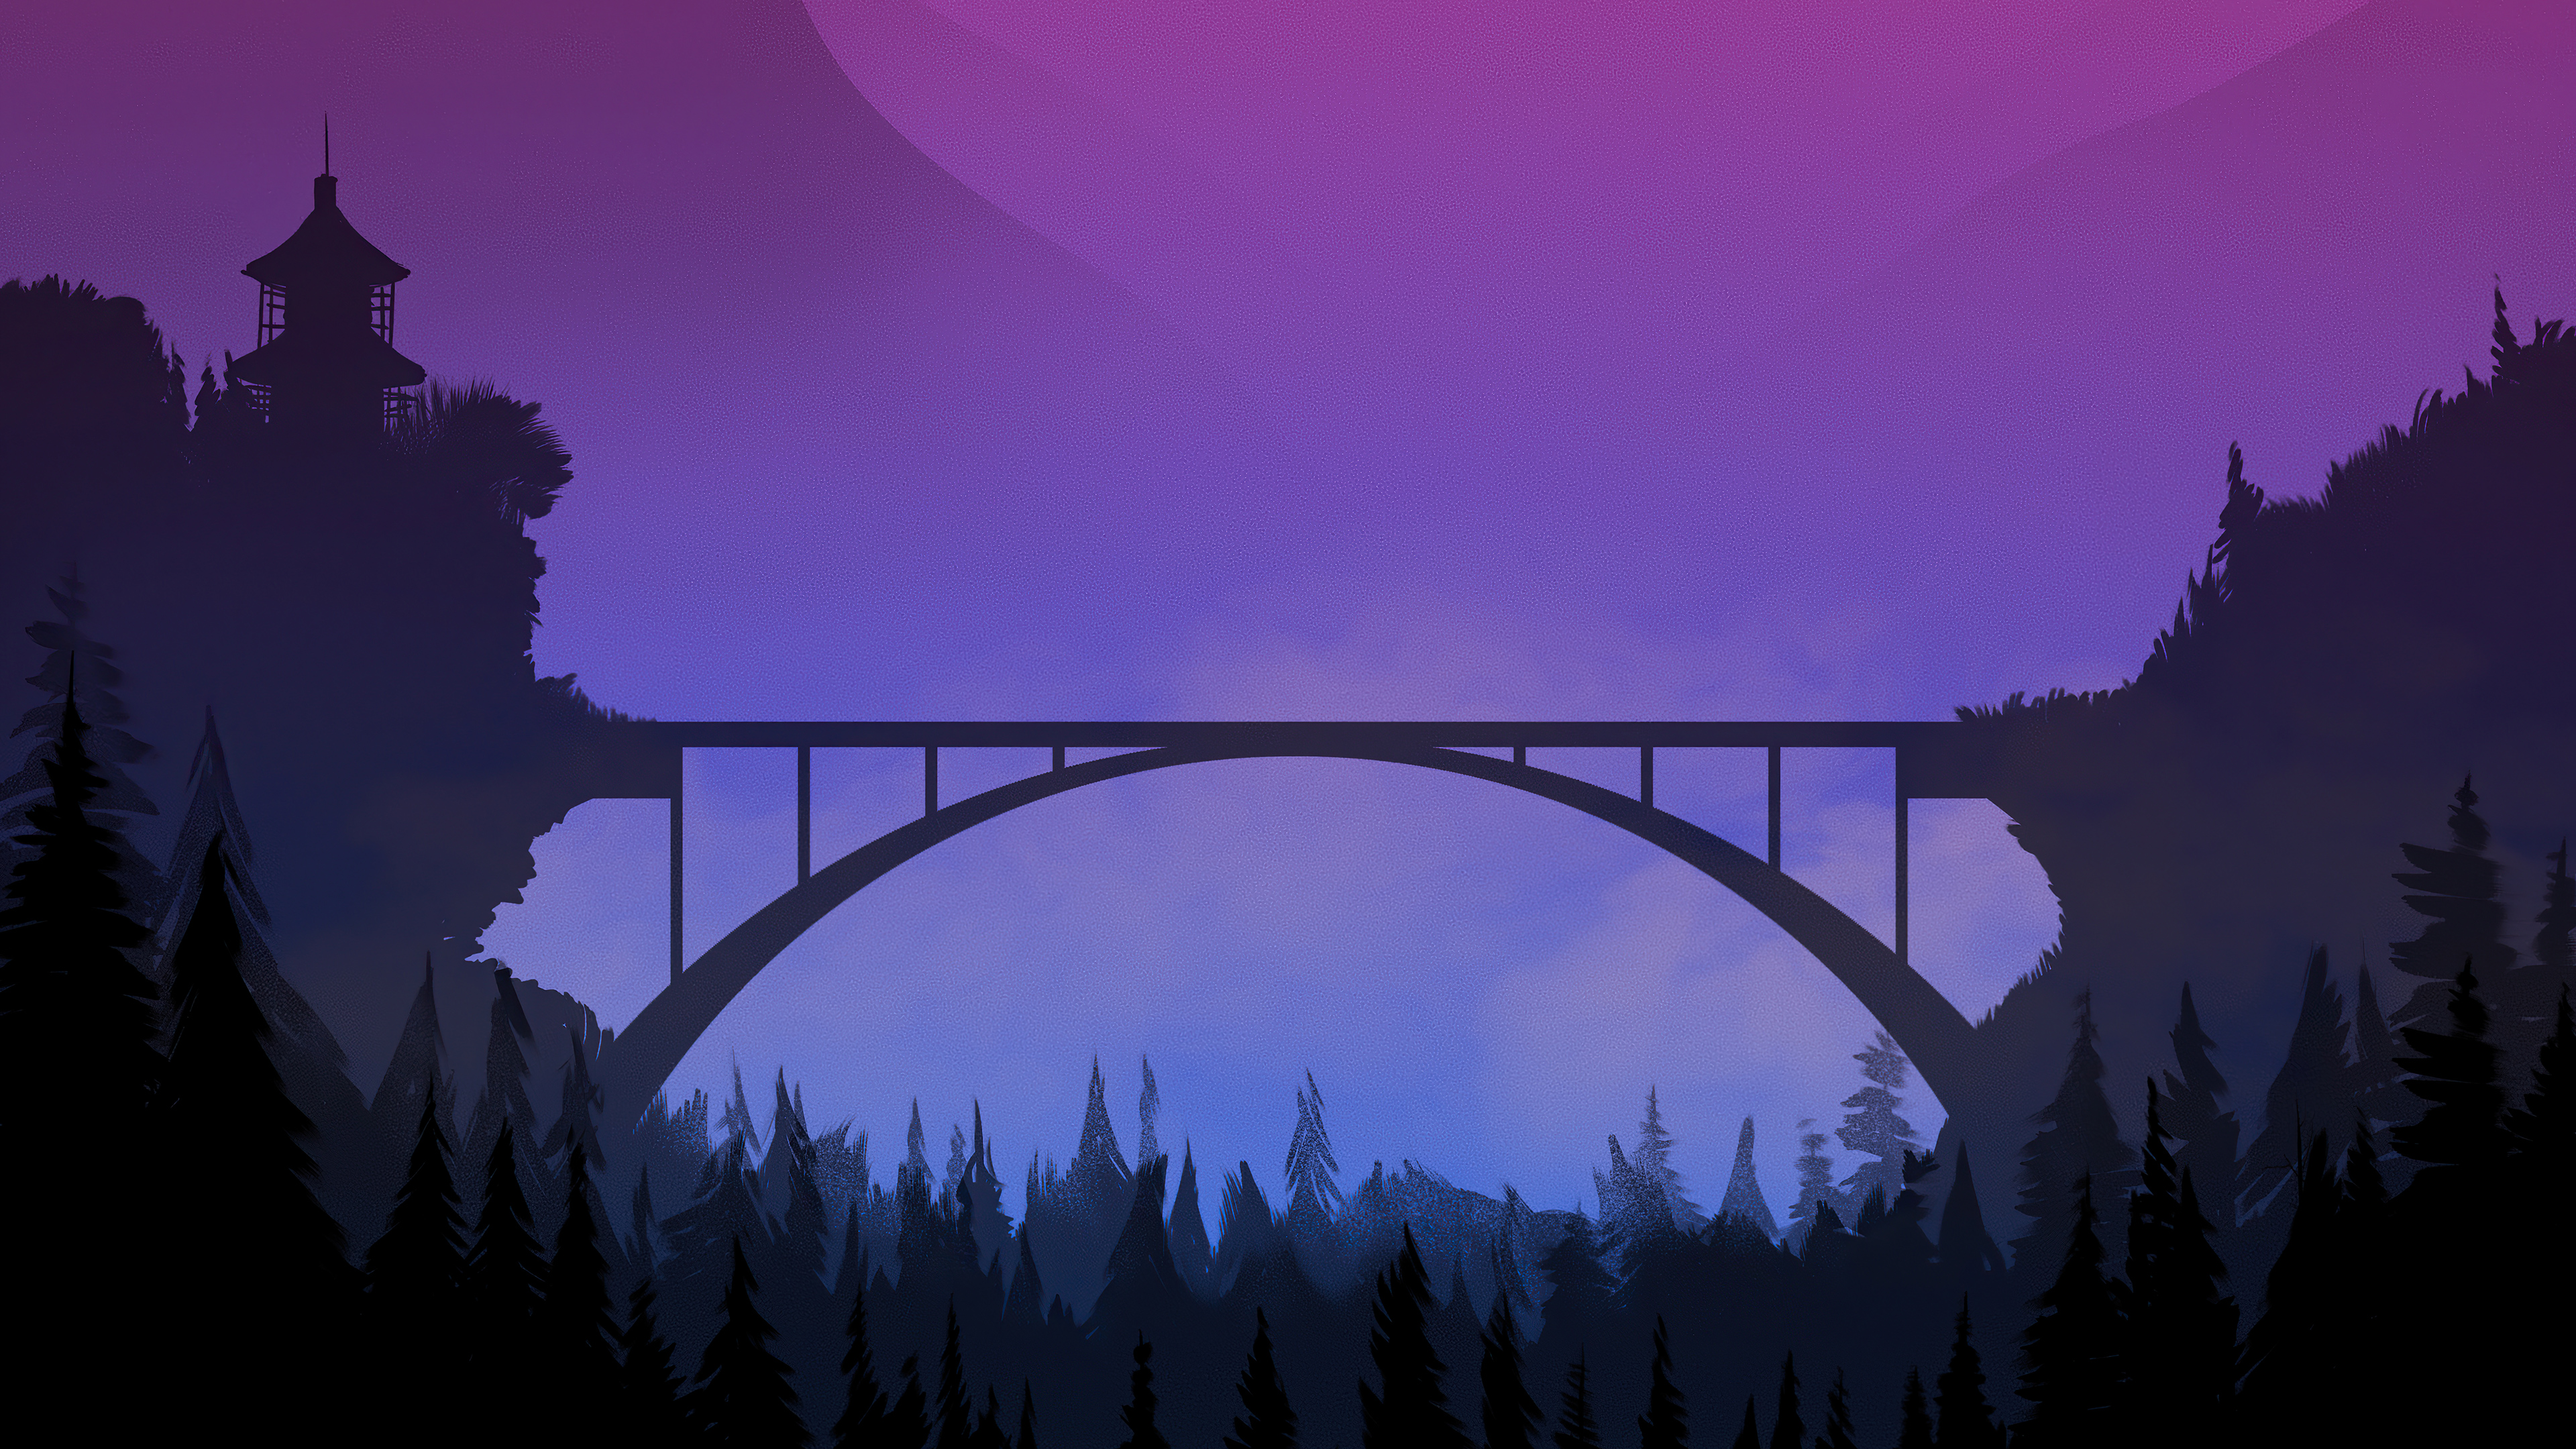 bridge sunset minimal 4k 1608659193 - Bridge Sunset Minimal 4k - Bridge Sunset Minimal 4k wallpapers